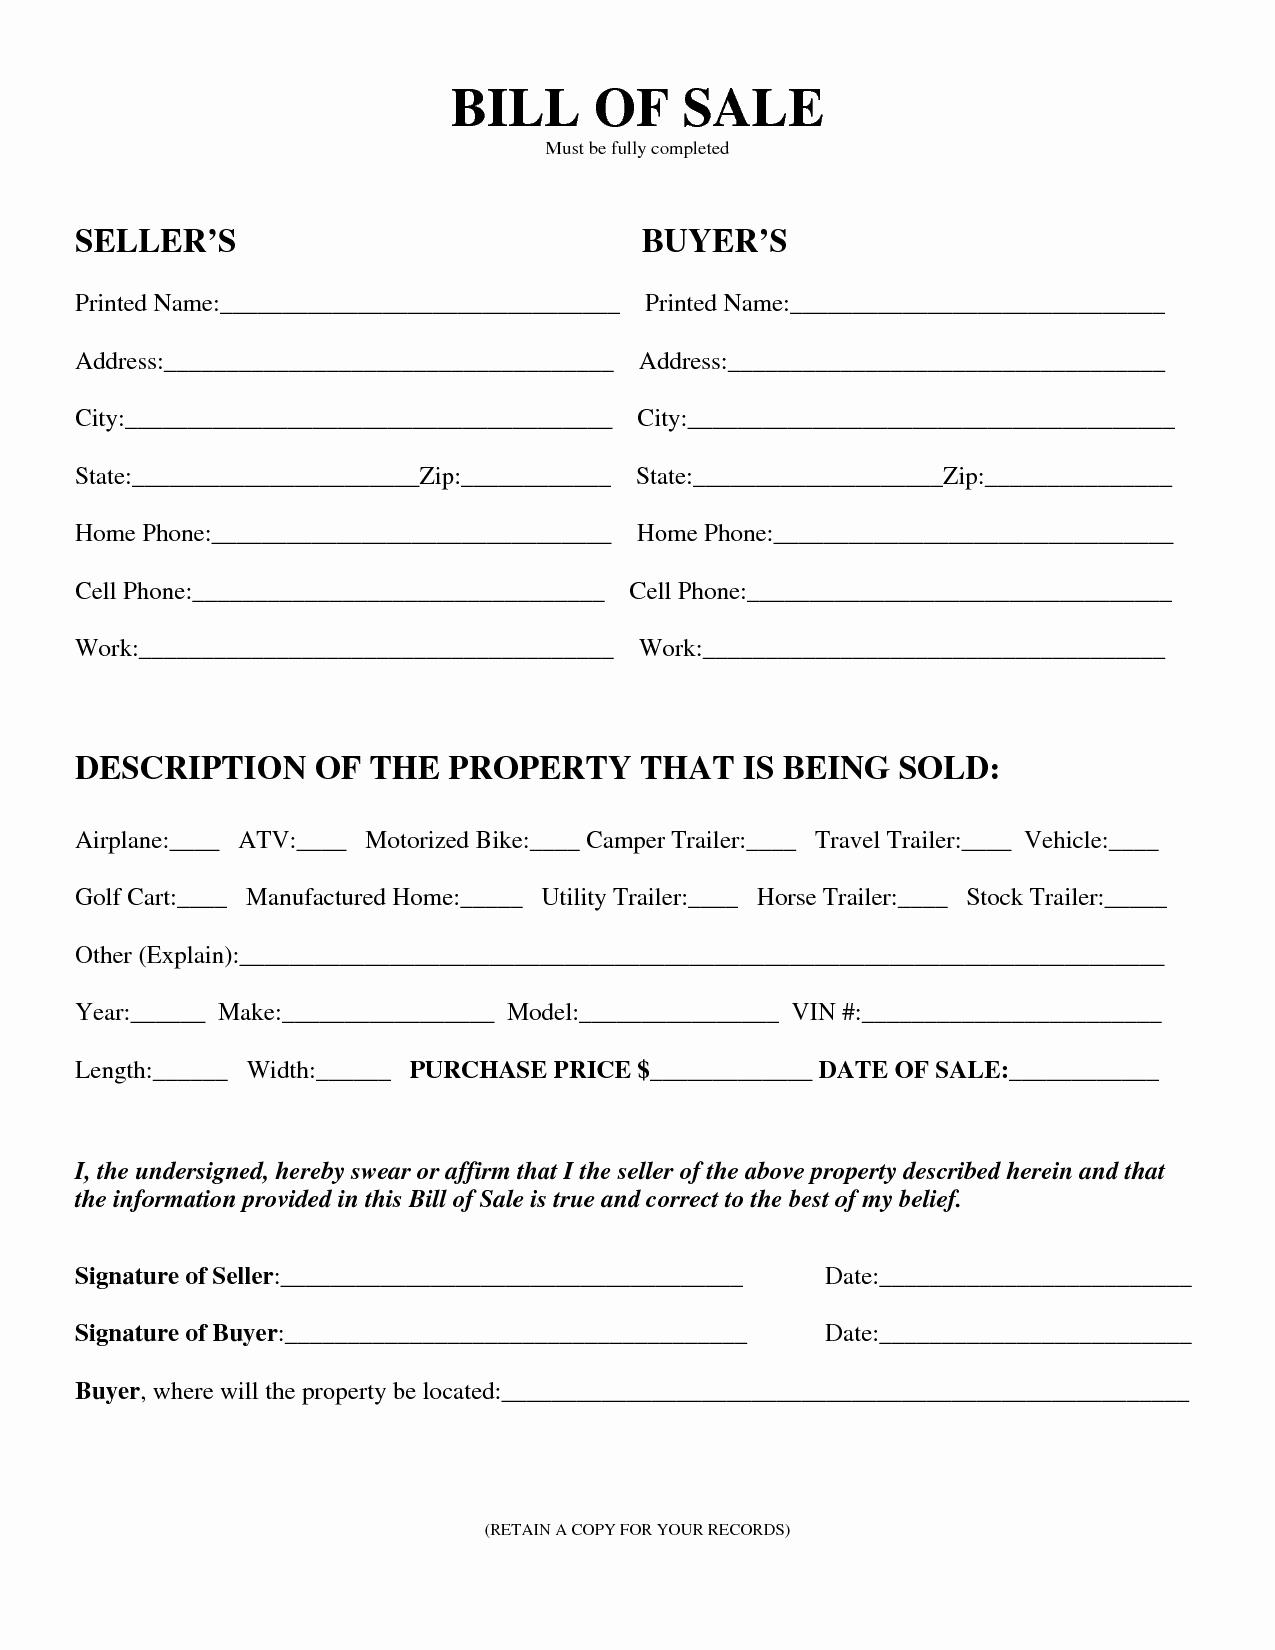 Illinois Motorcycle Bill Of Sale Fresh Bill Sale Sample Document Mughals